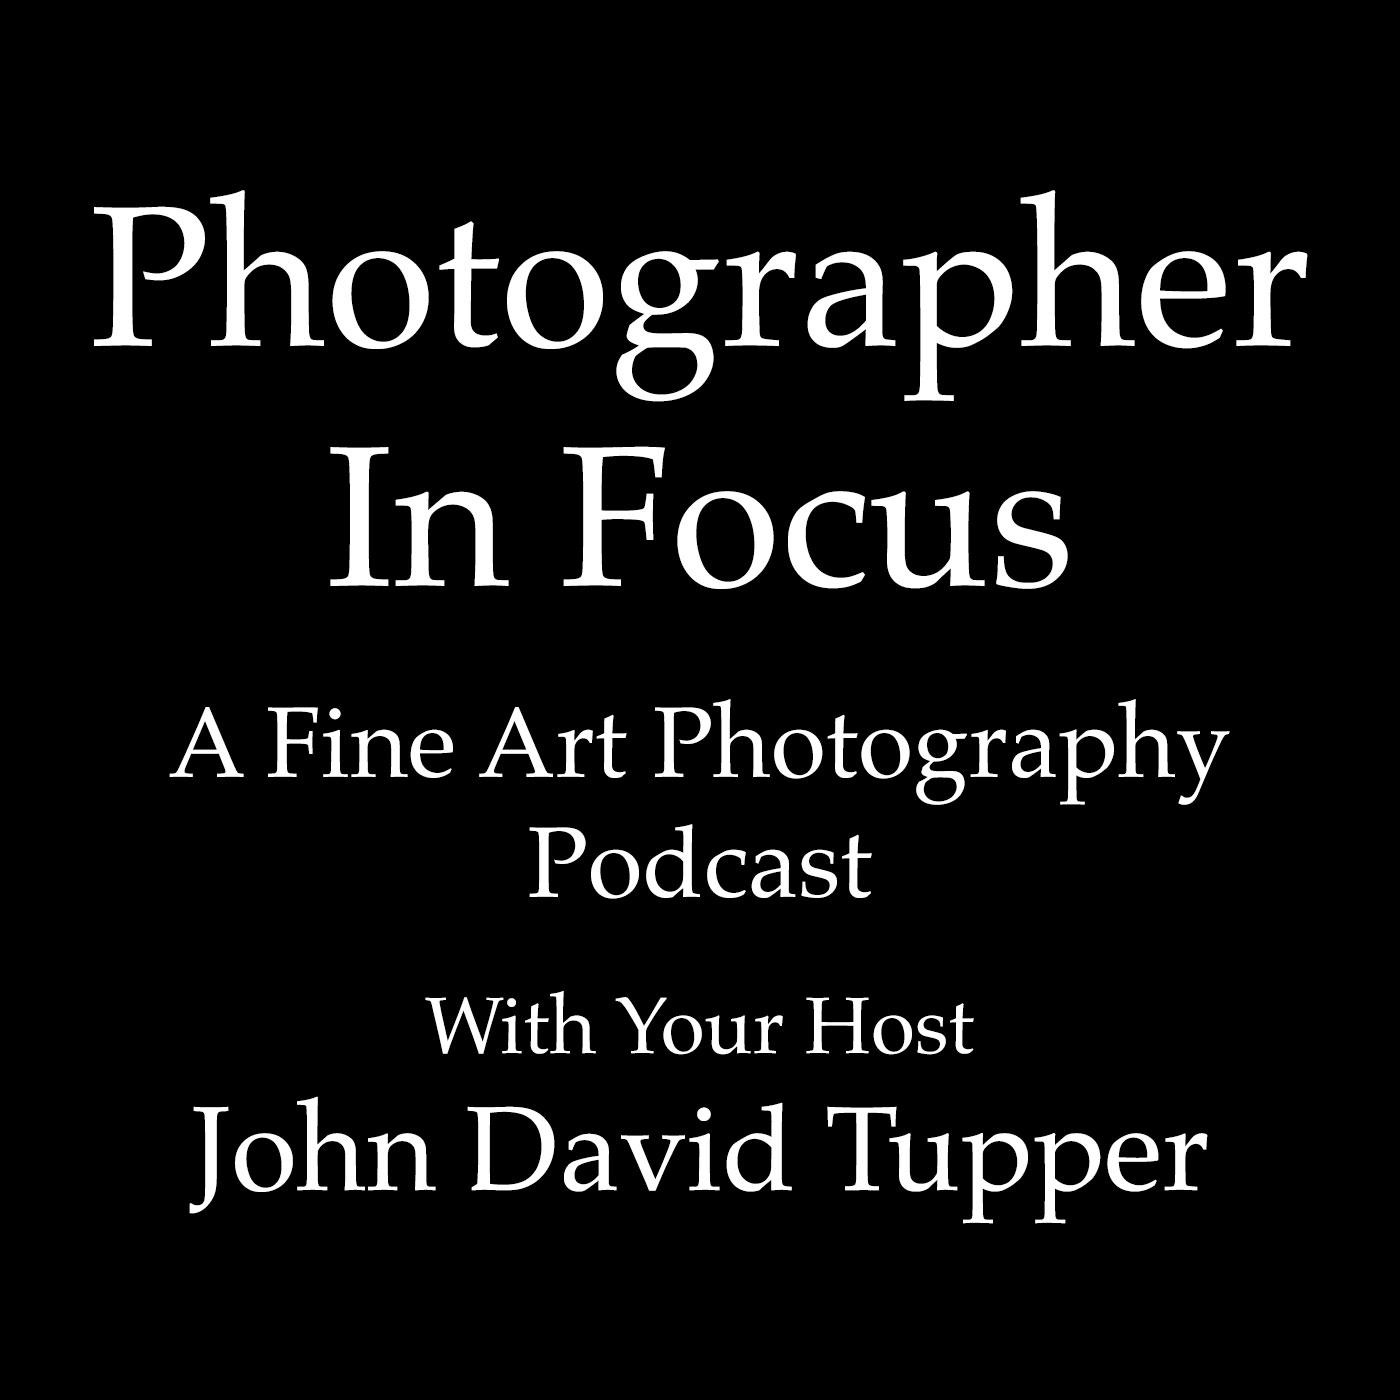 004: Patrick Roddie PT 1 Of 2 | Photographer In Focus show art